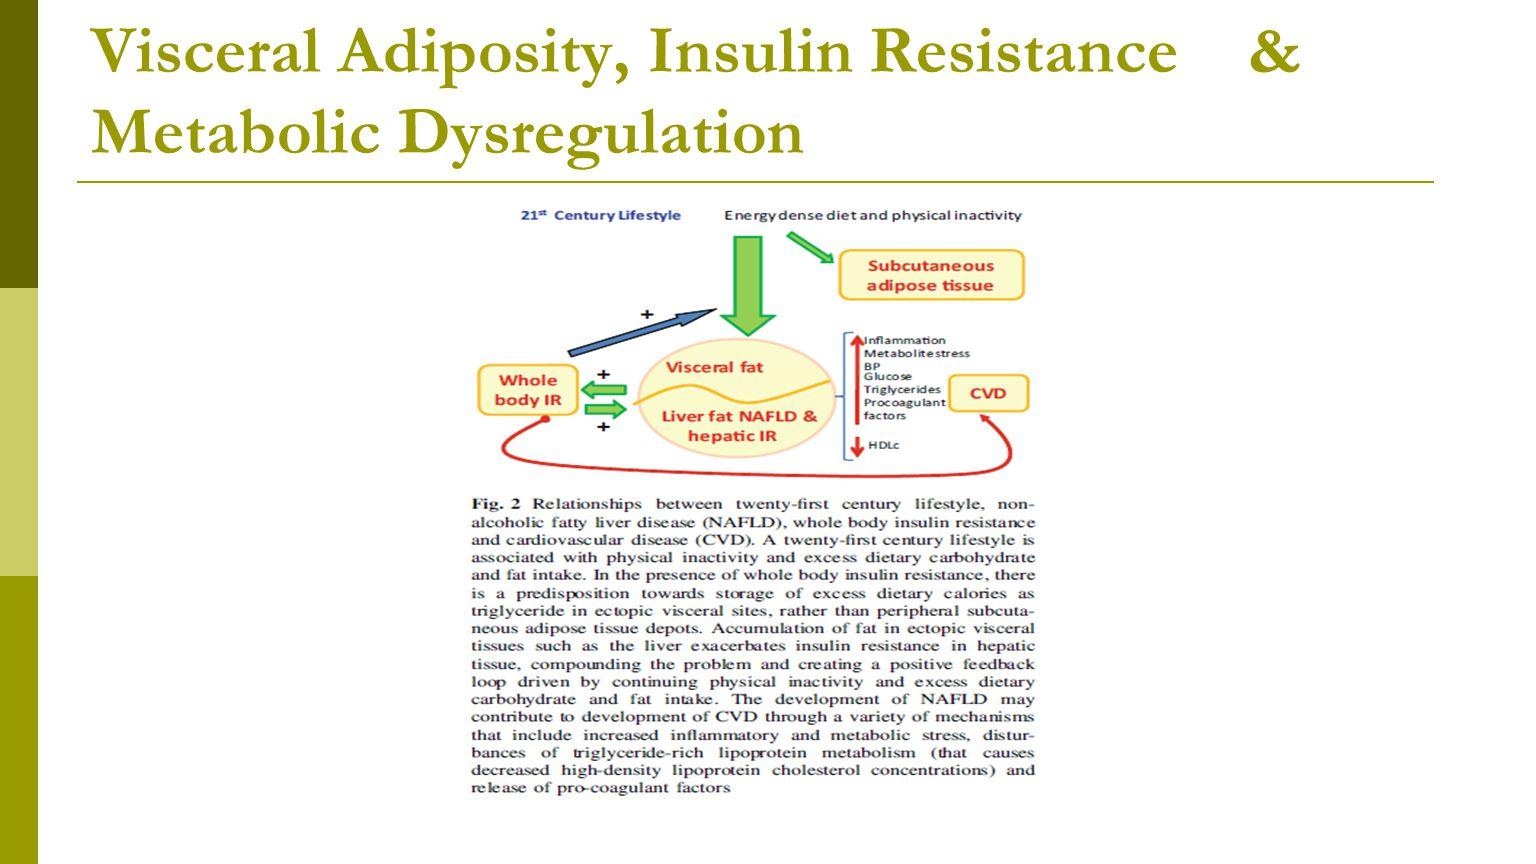 Visceral Adiposity, Insulin Resistance & Metabolic Dysregulation